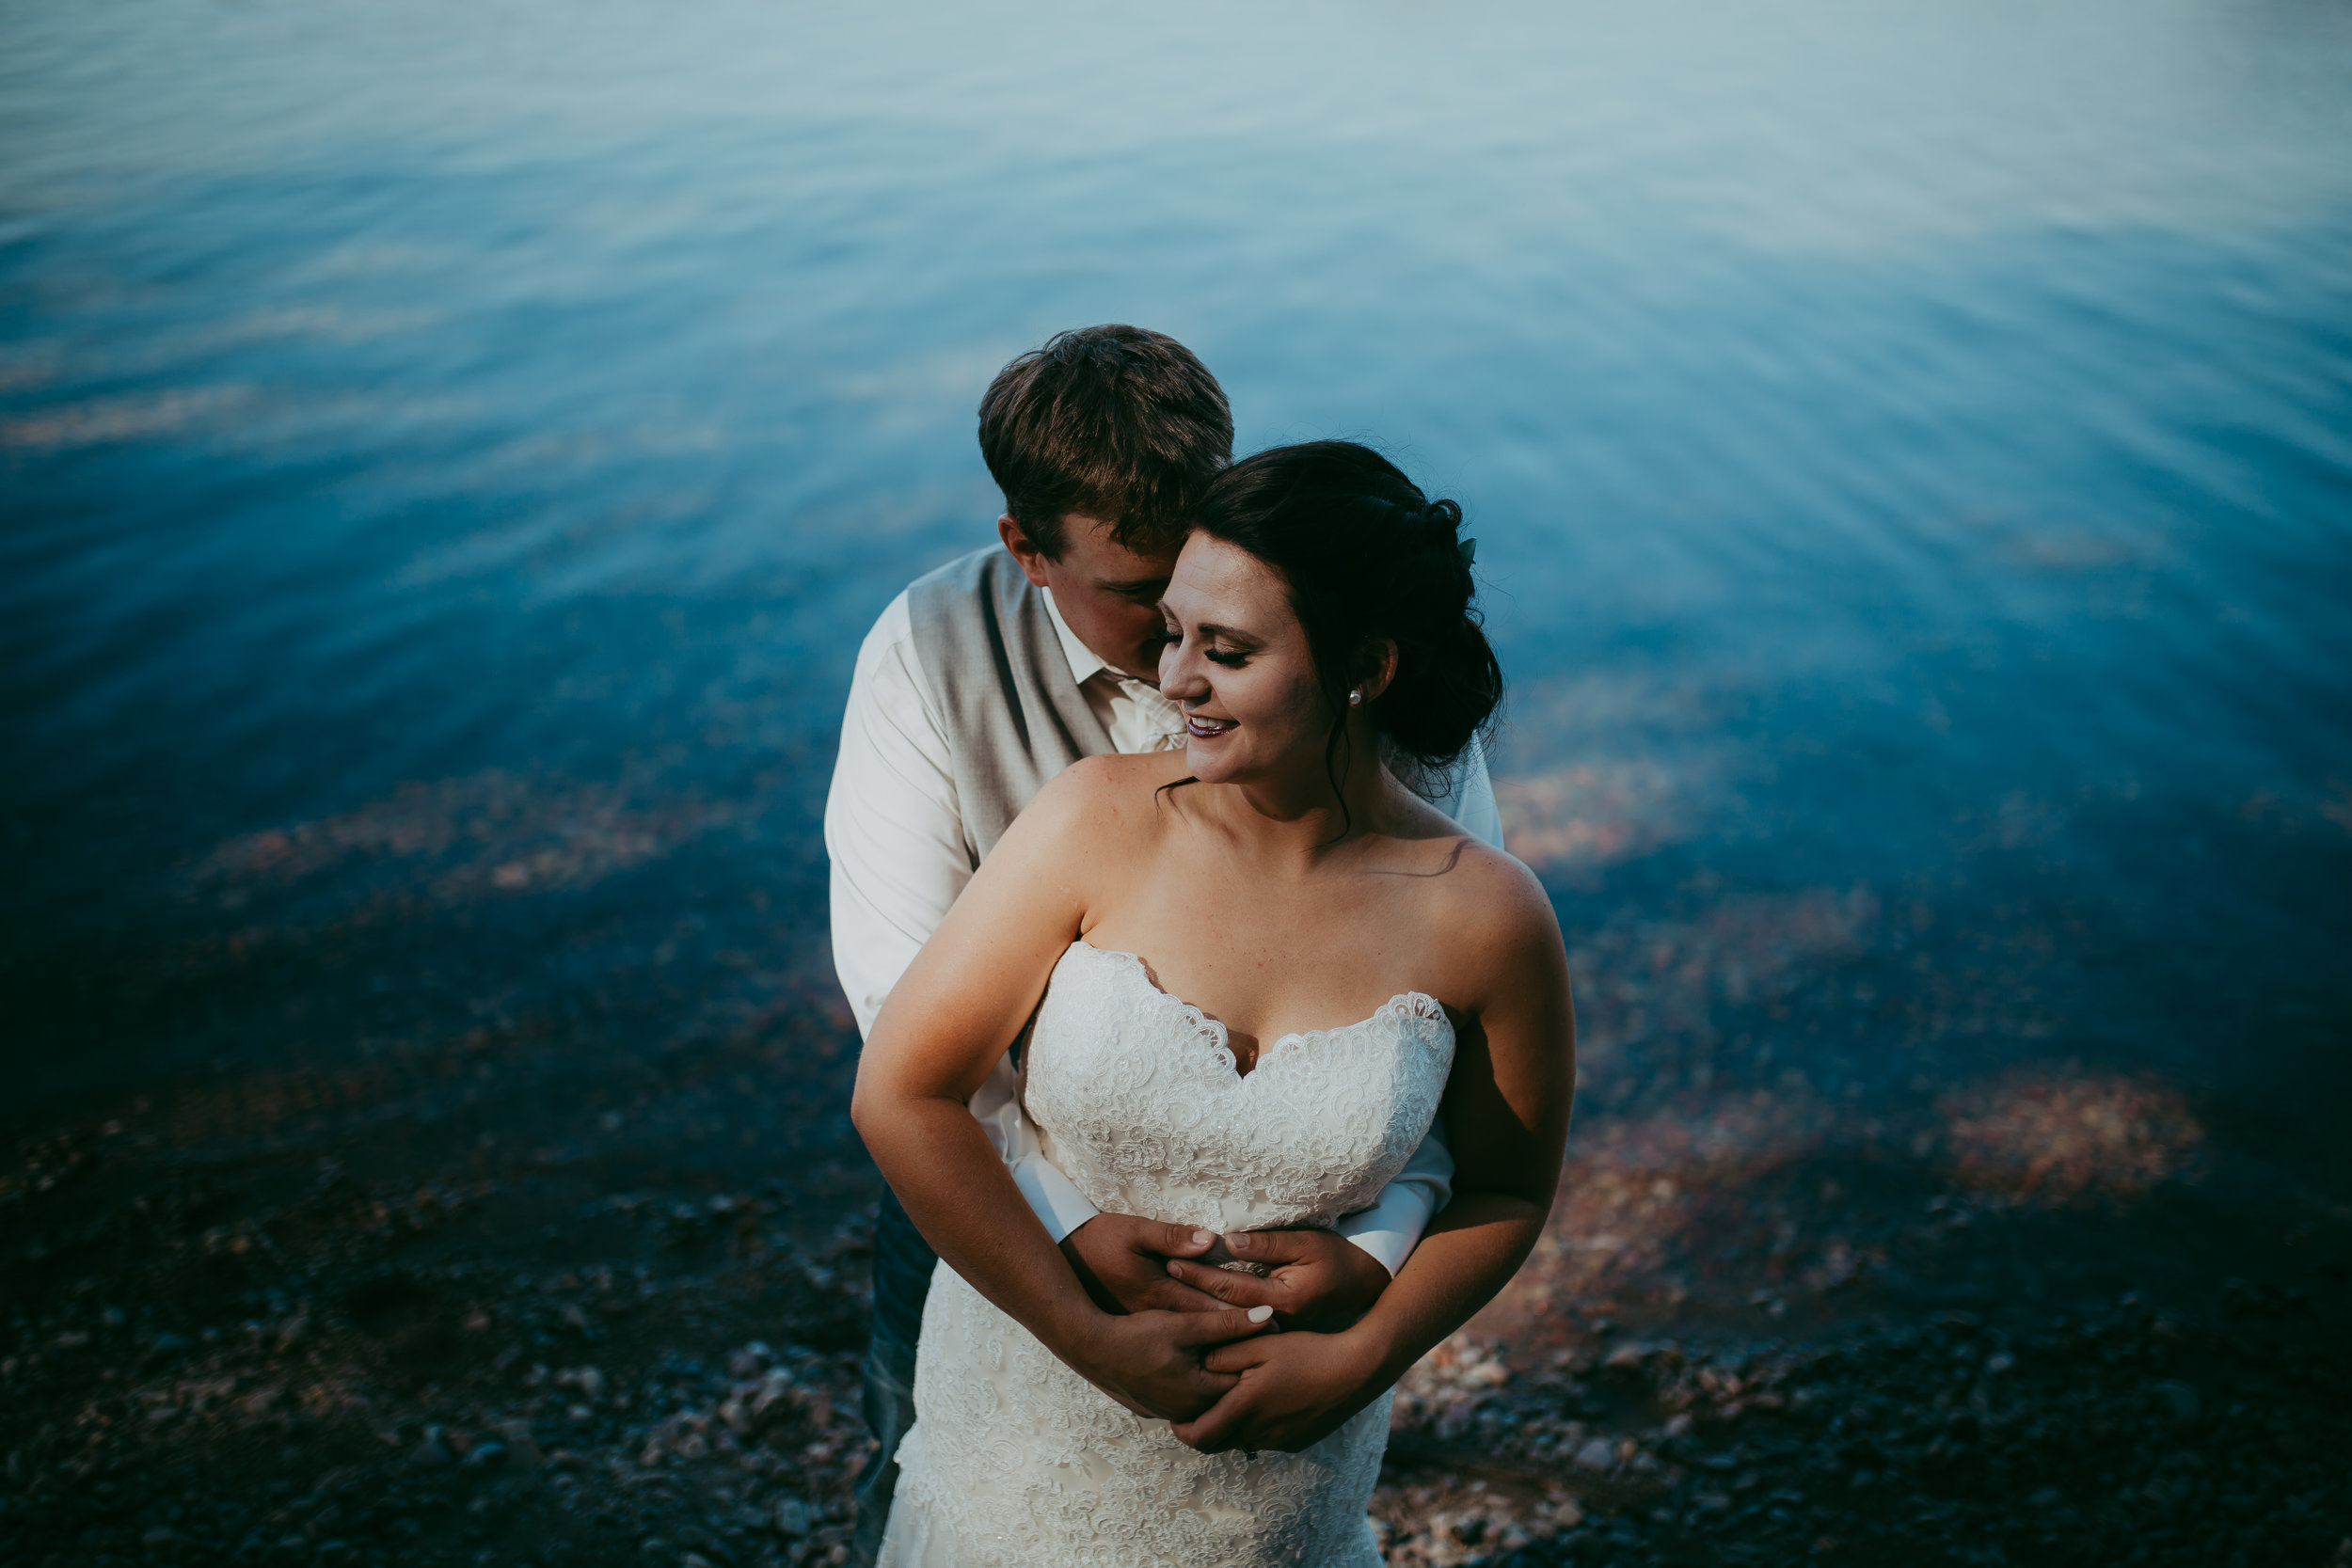 bridal portraits245.jpg